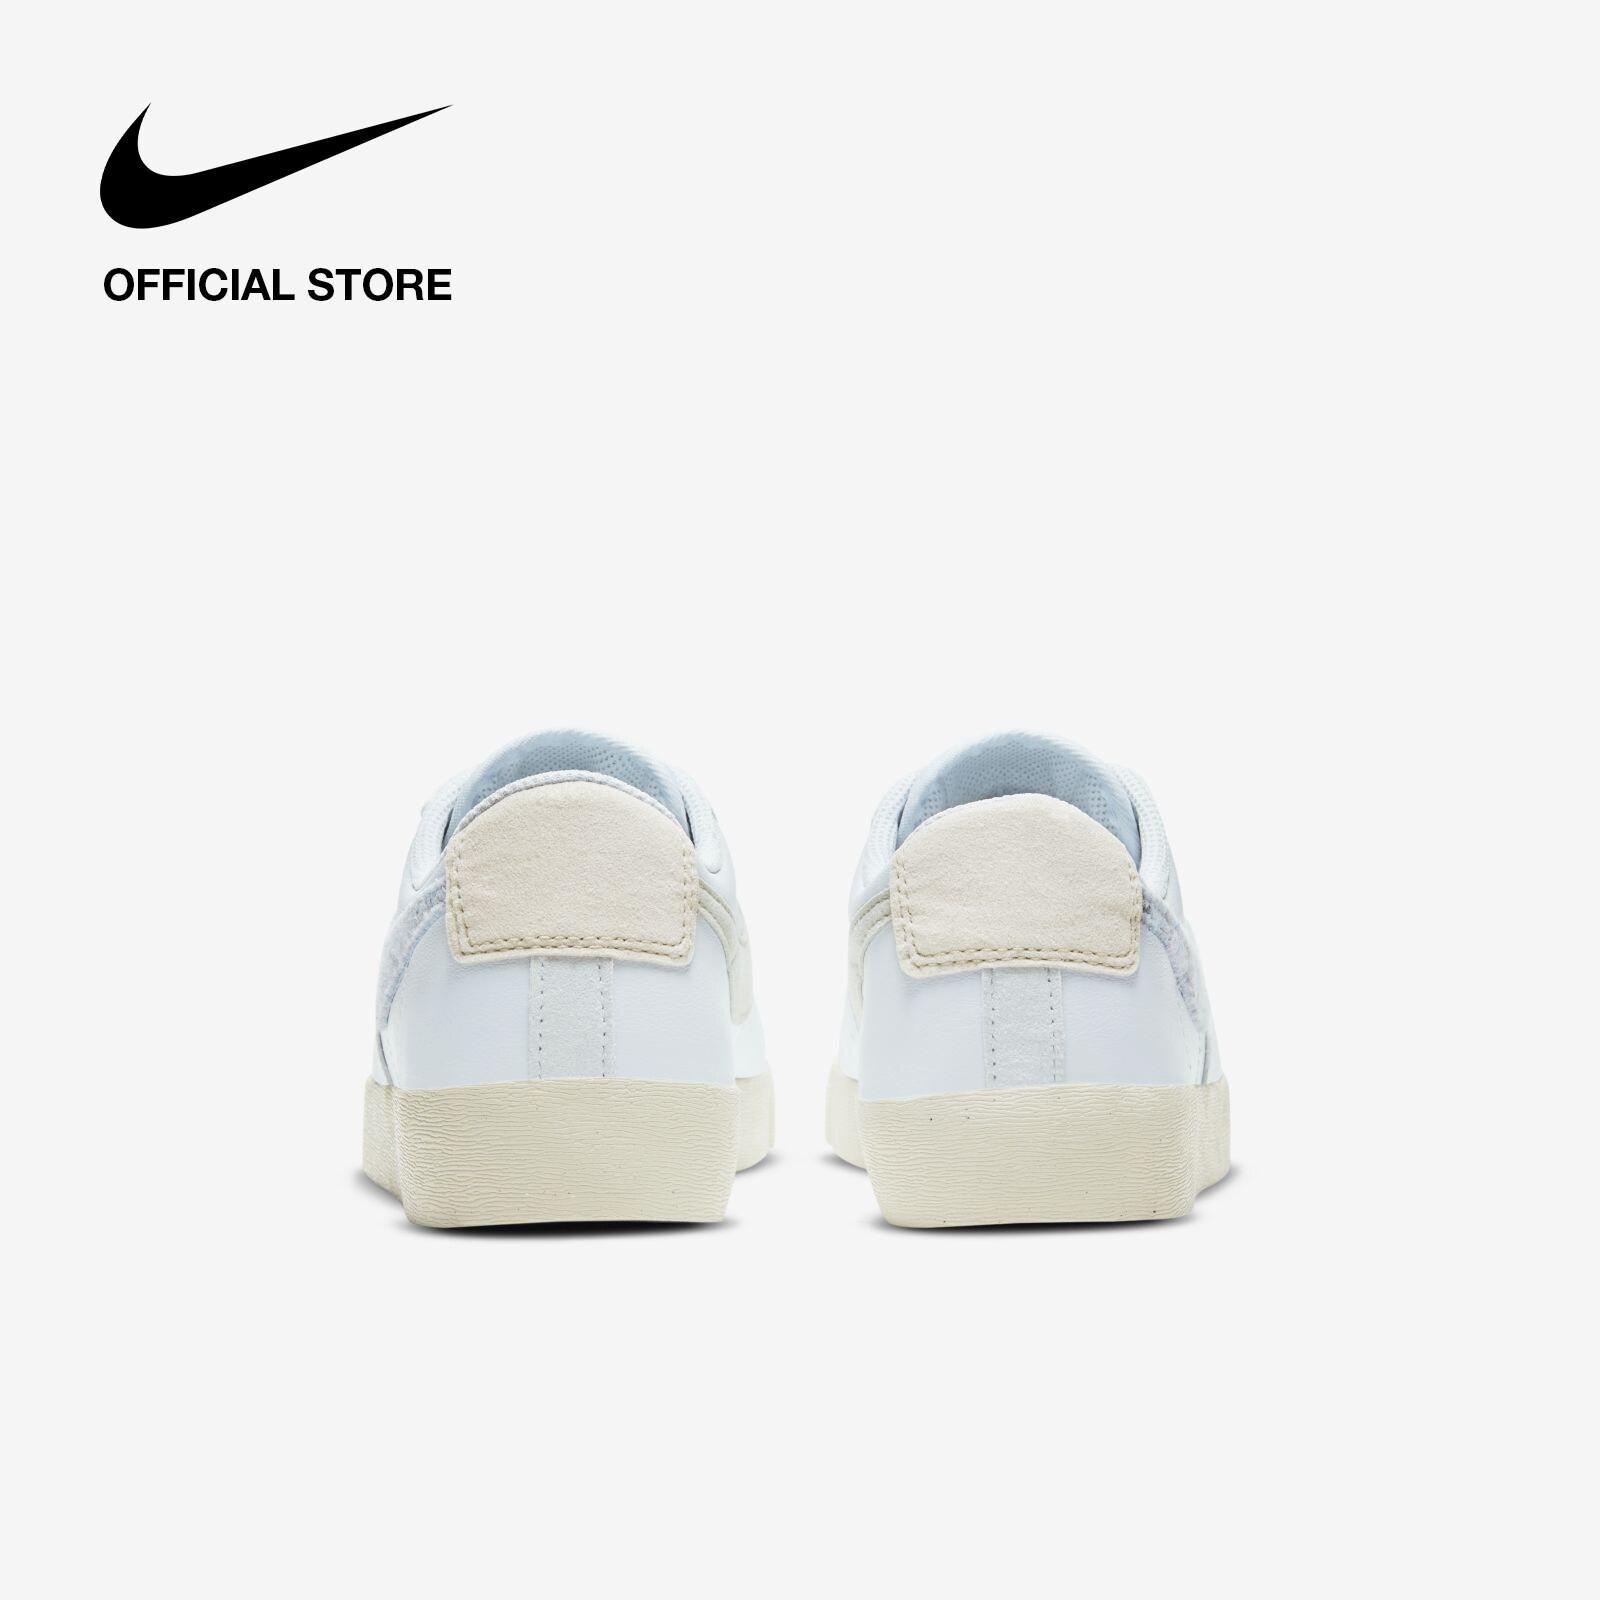 Nike Women's Blazer Low SE Shoes - Light Armory Blue ไนกี้ รองเท้าผู้หญิง เบลซเซอร์ โลว เอสอี - สีฟ้า